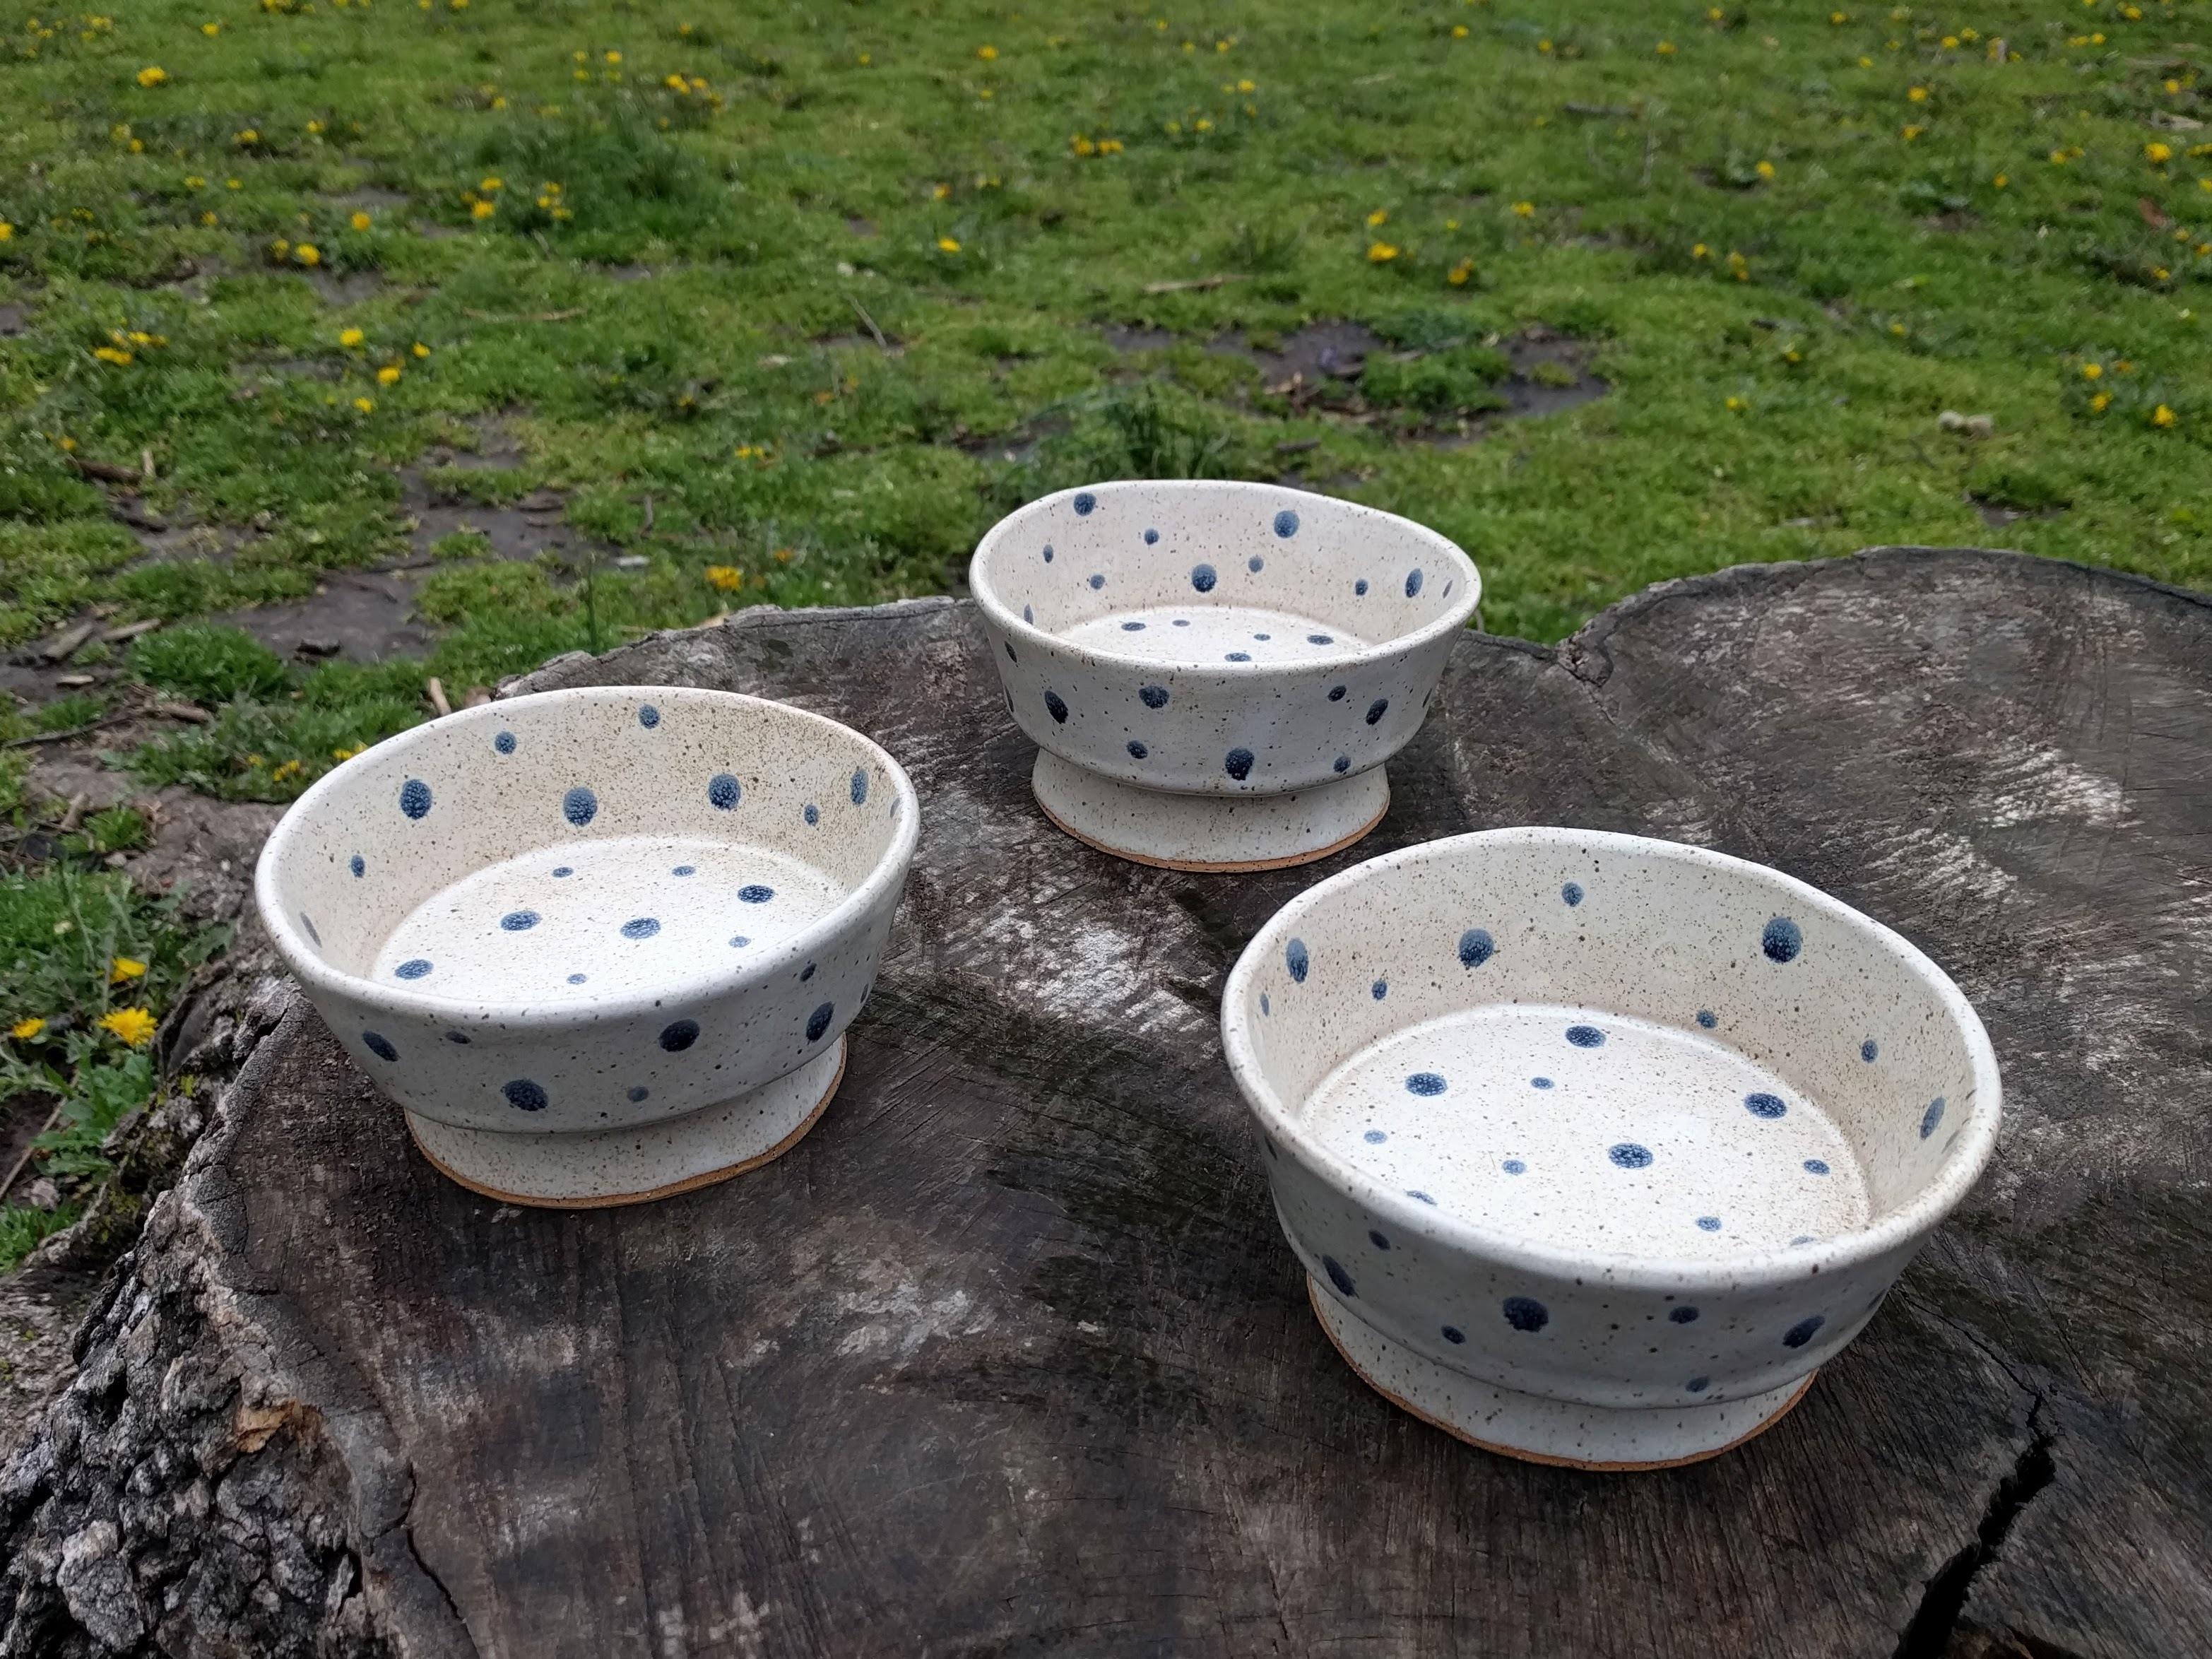 Three speckled bowls sitting on a tree stump.